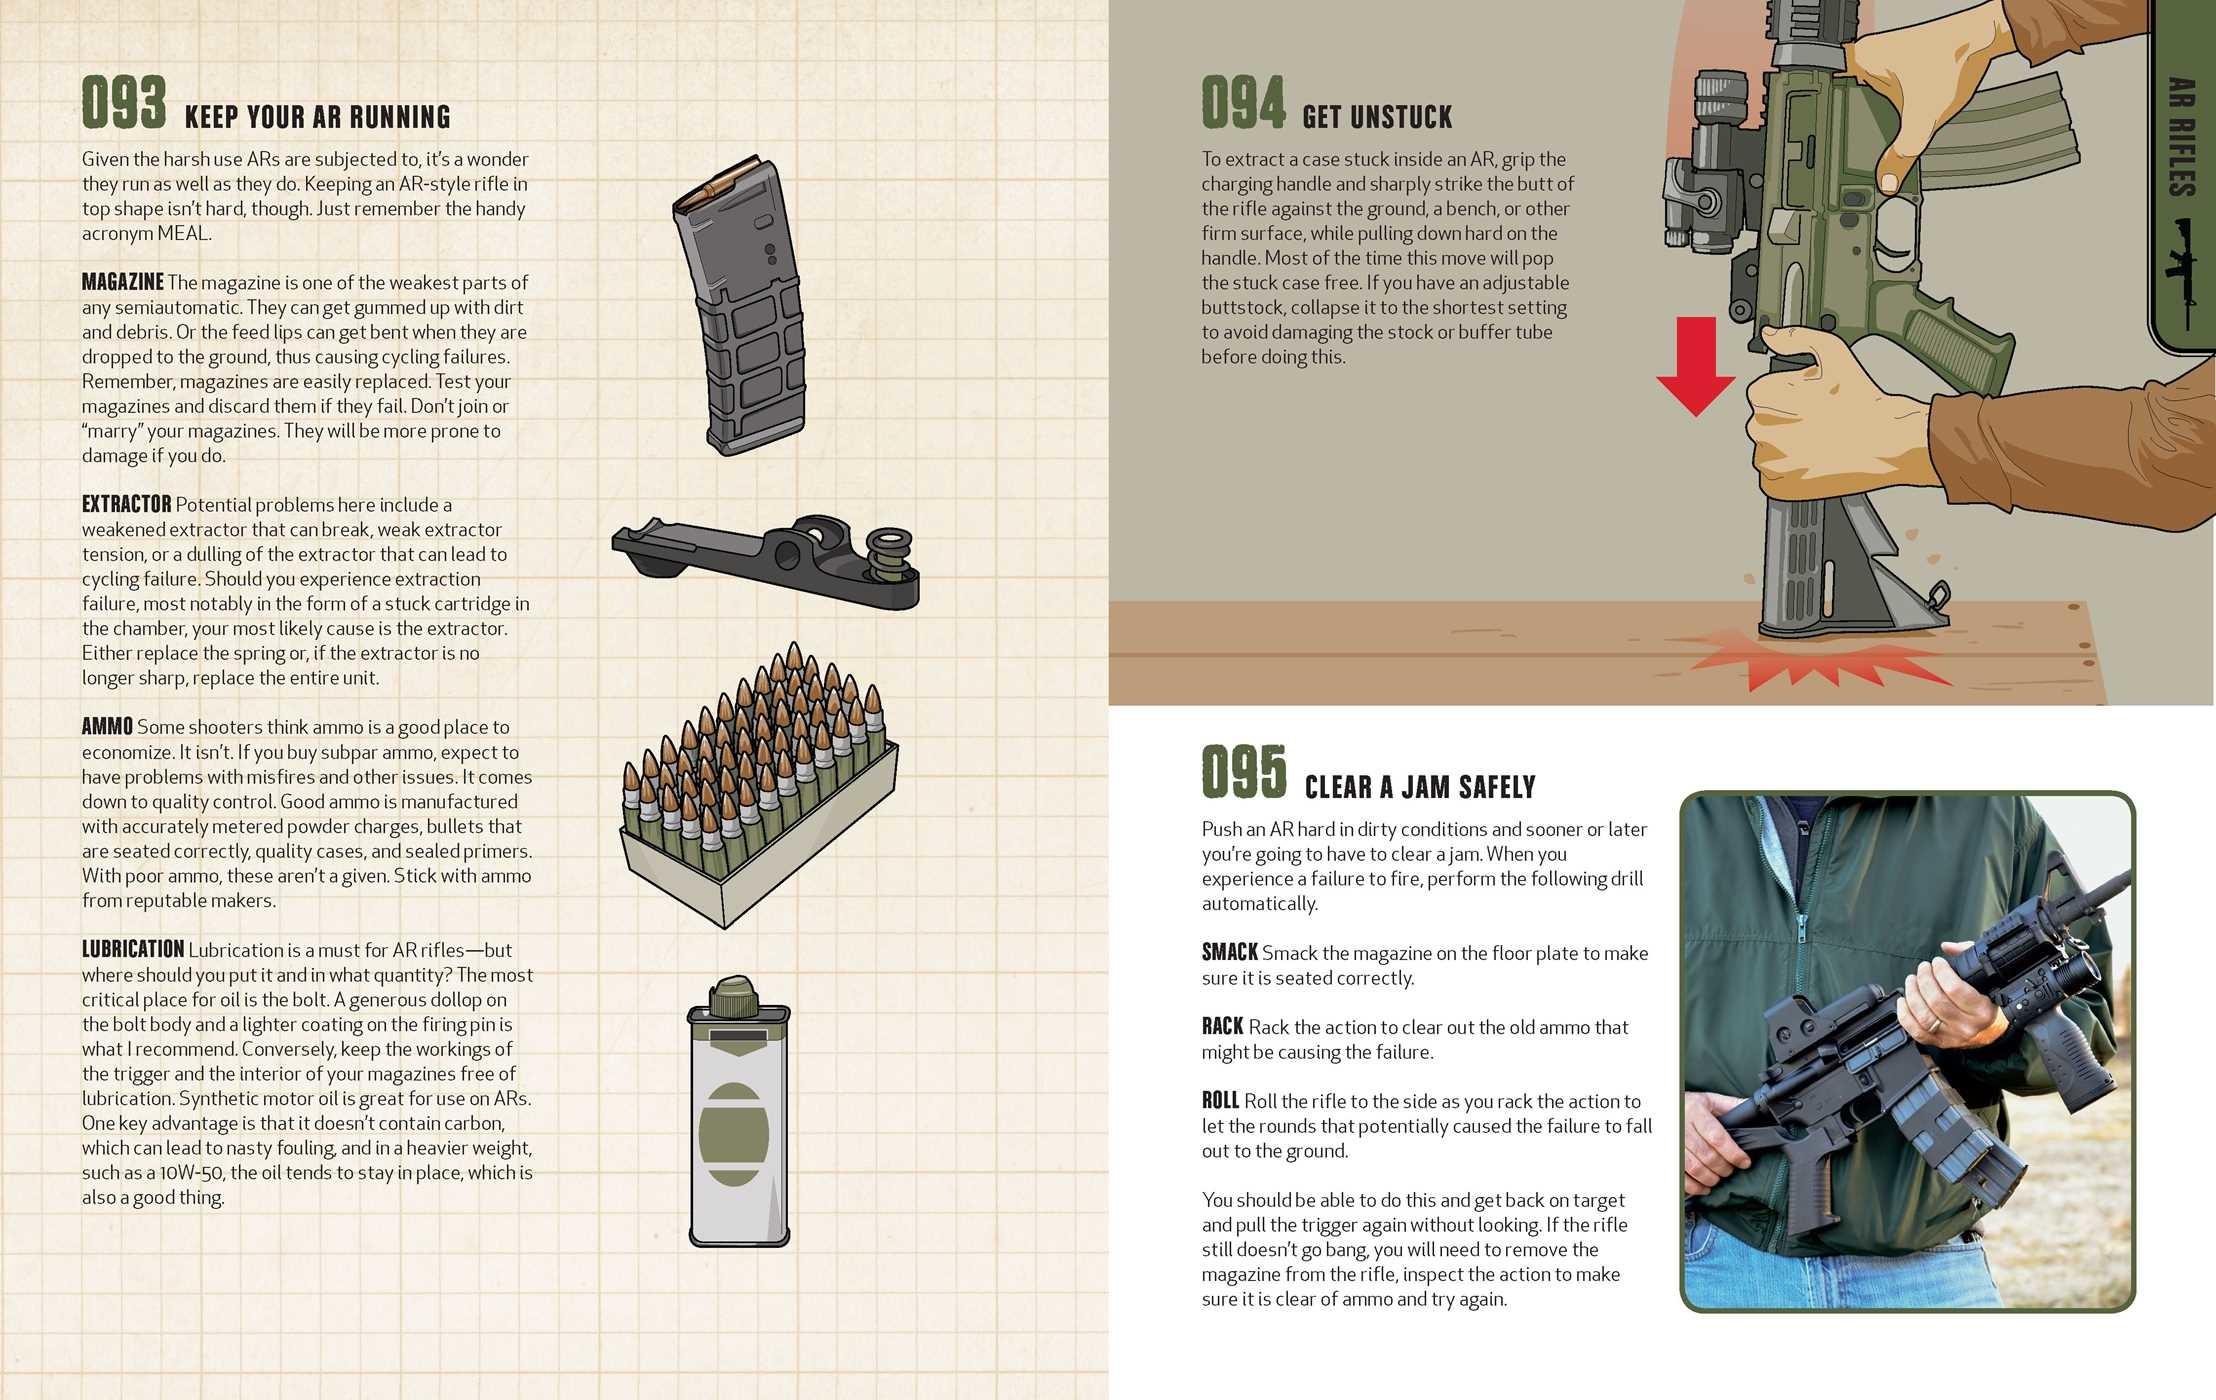 The ultimate shooting skills manual 9781616288327.in05